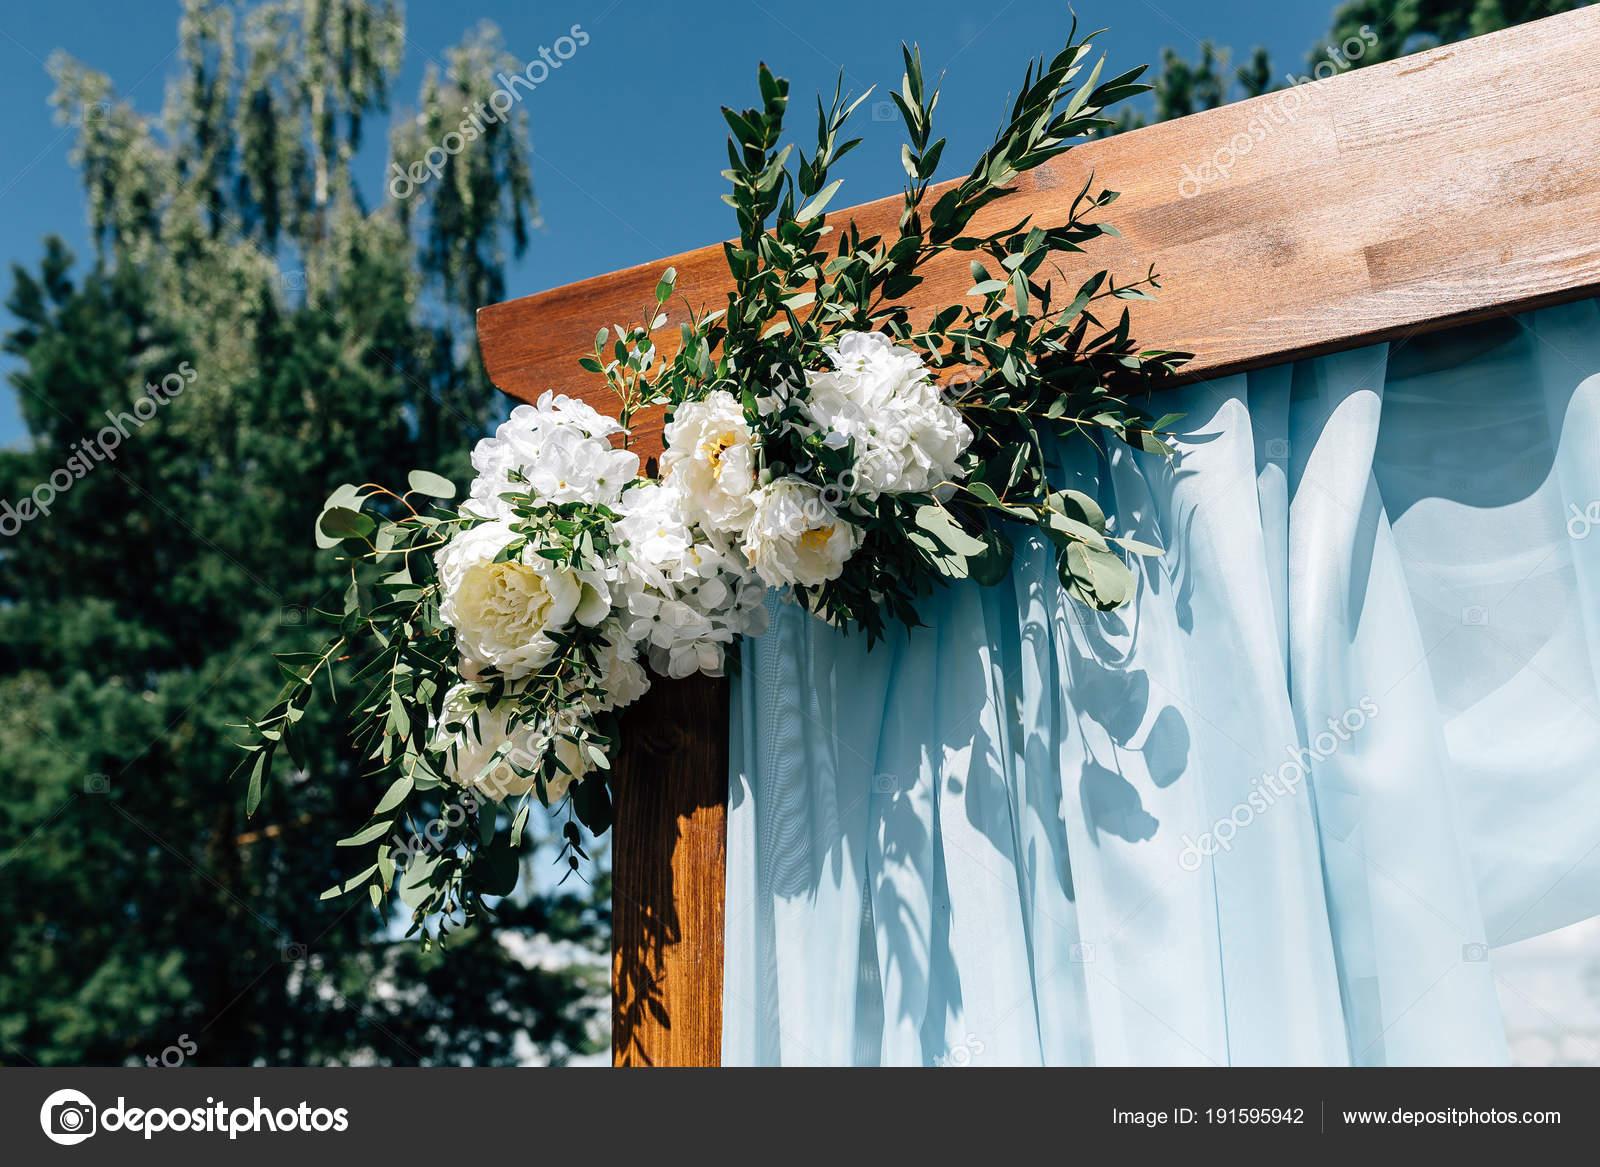 Outdoor Wedding Decorations Stock Photo Vikstrel 191595942